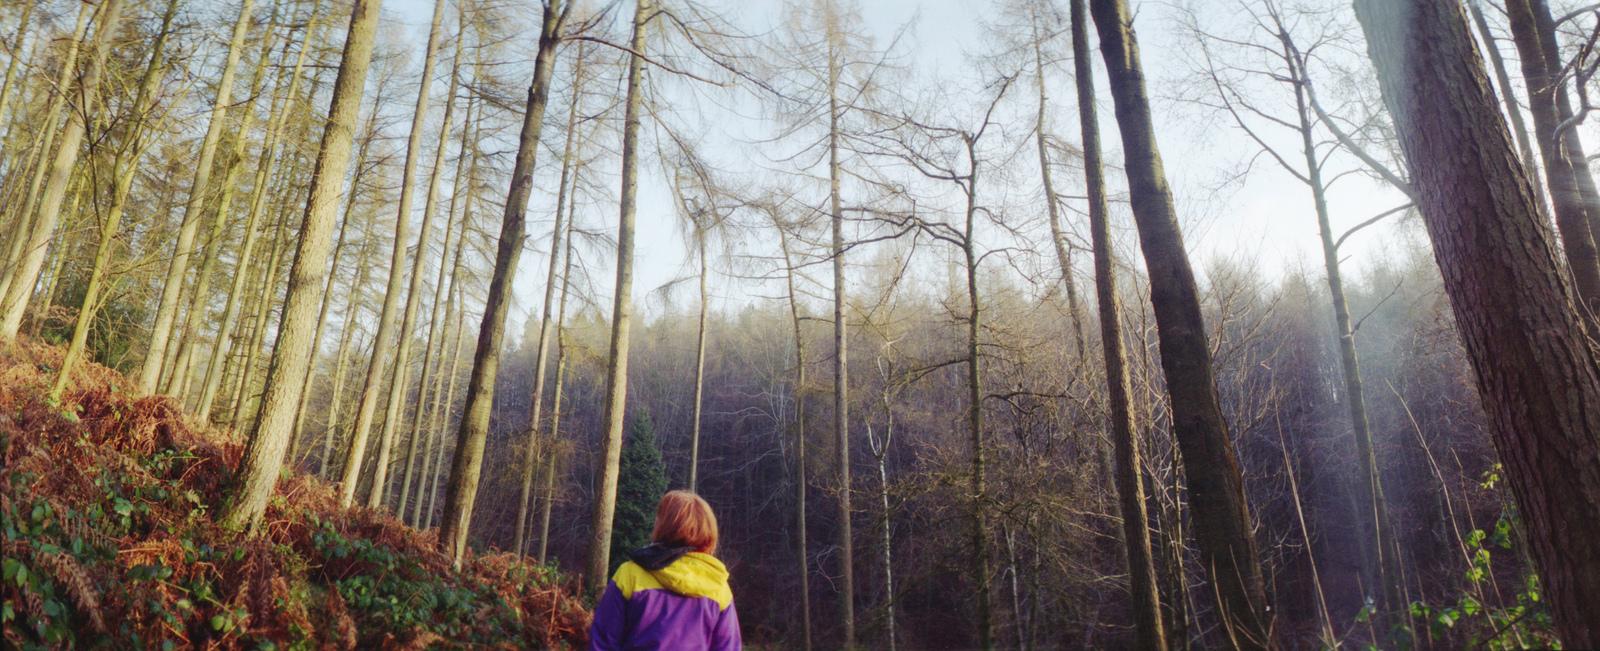 analog_film_cameras_101.jpg